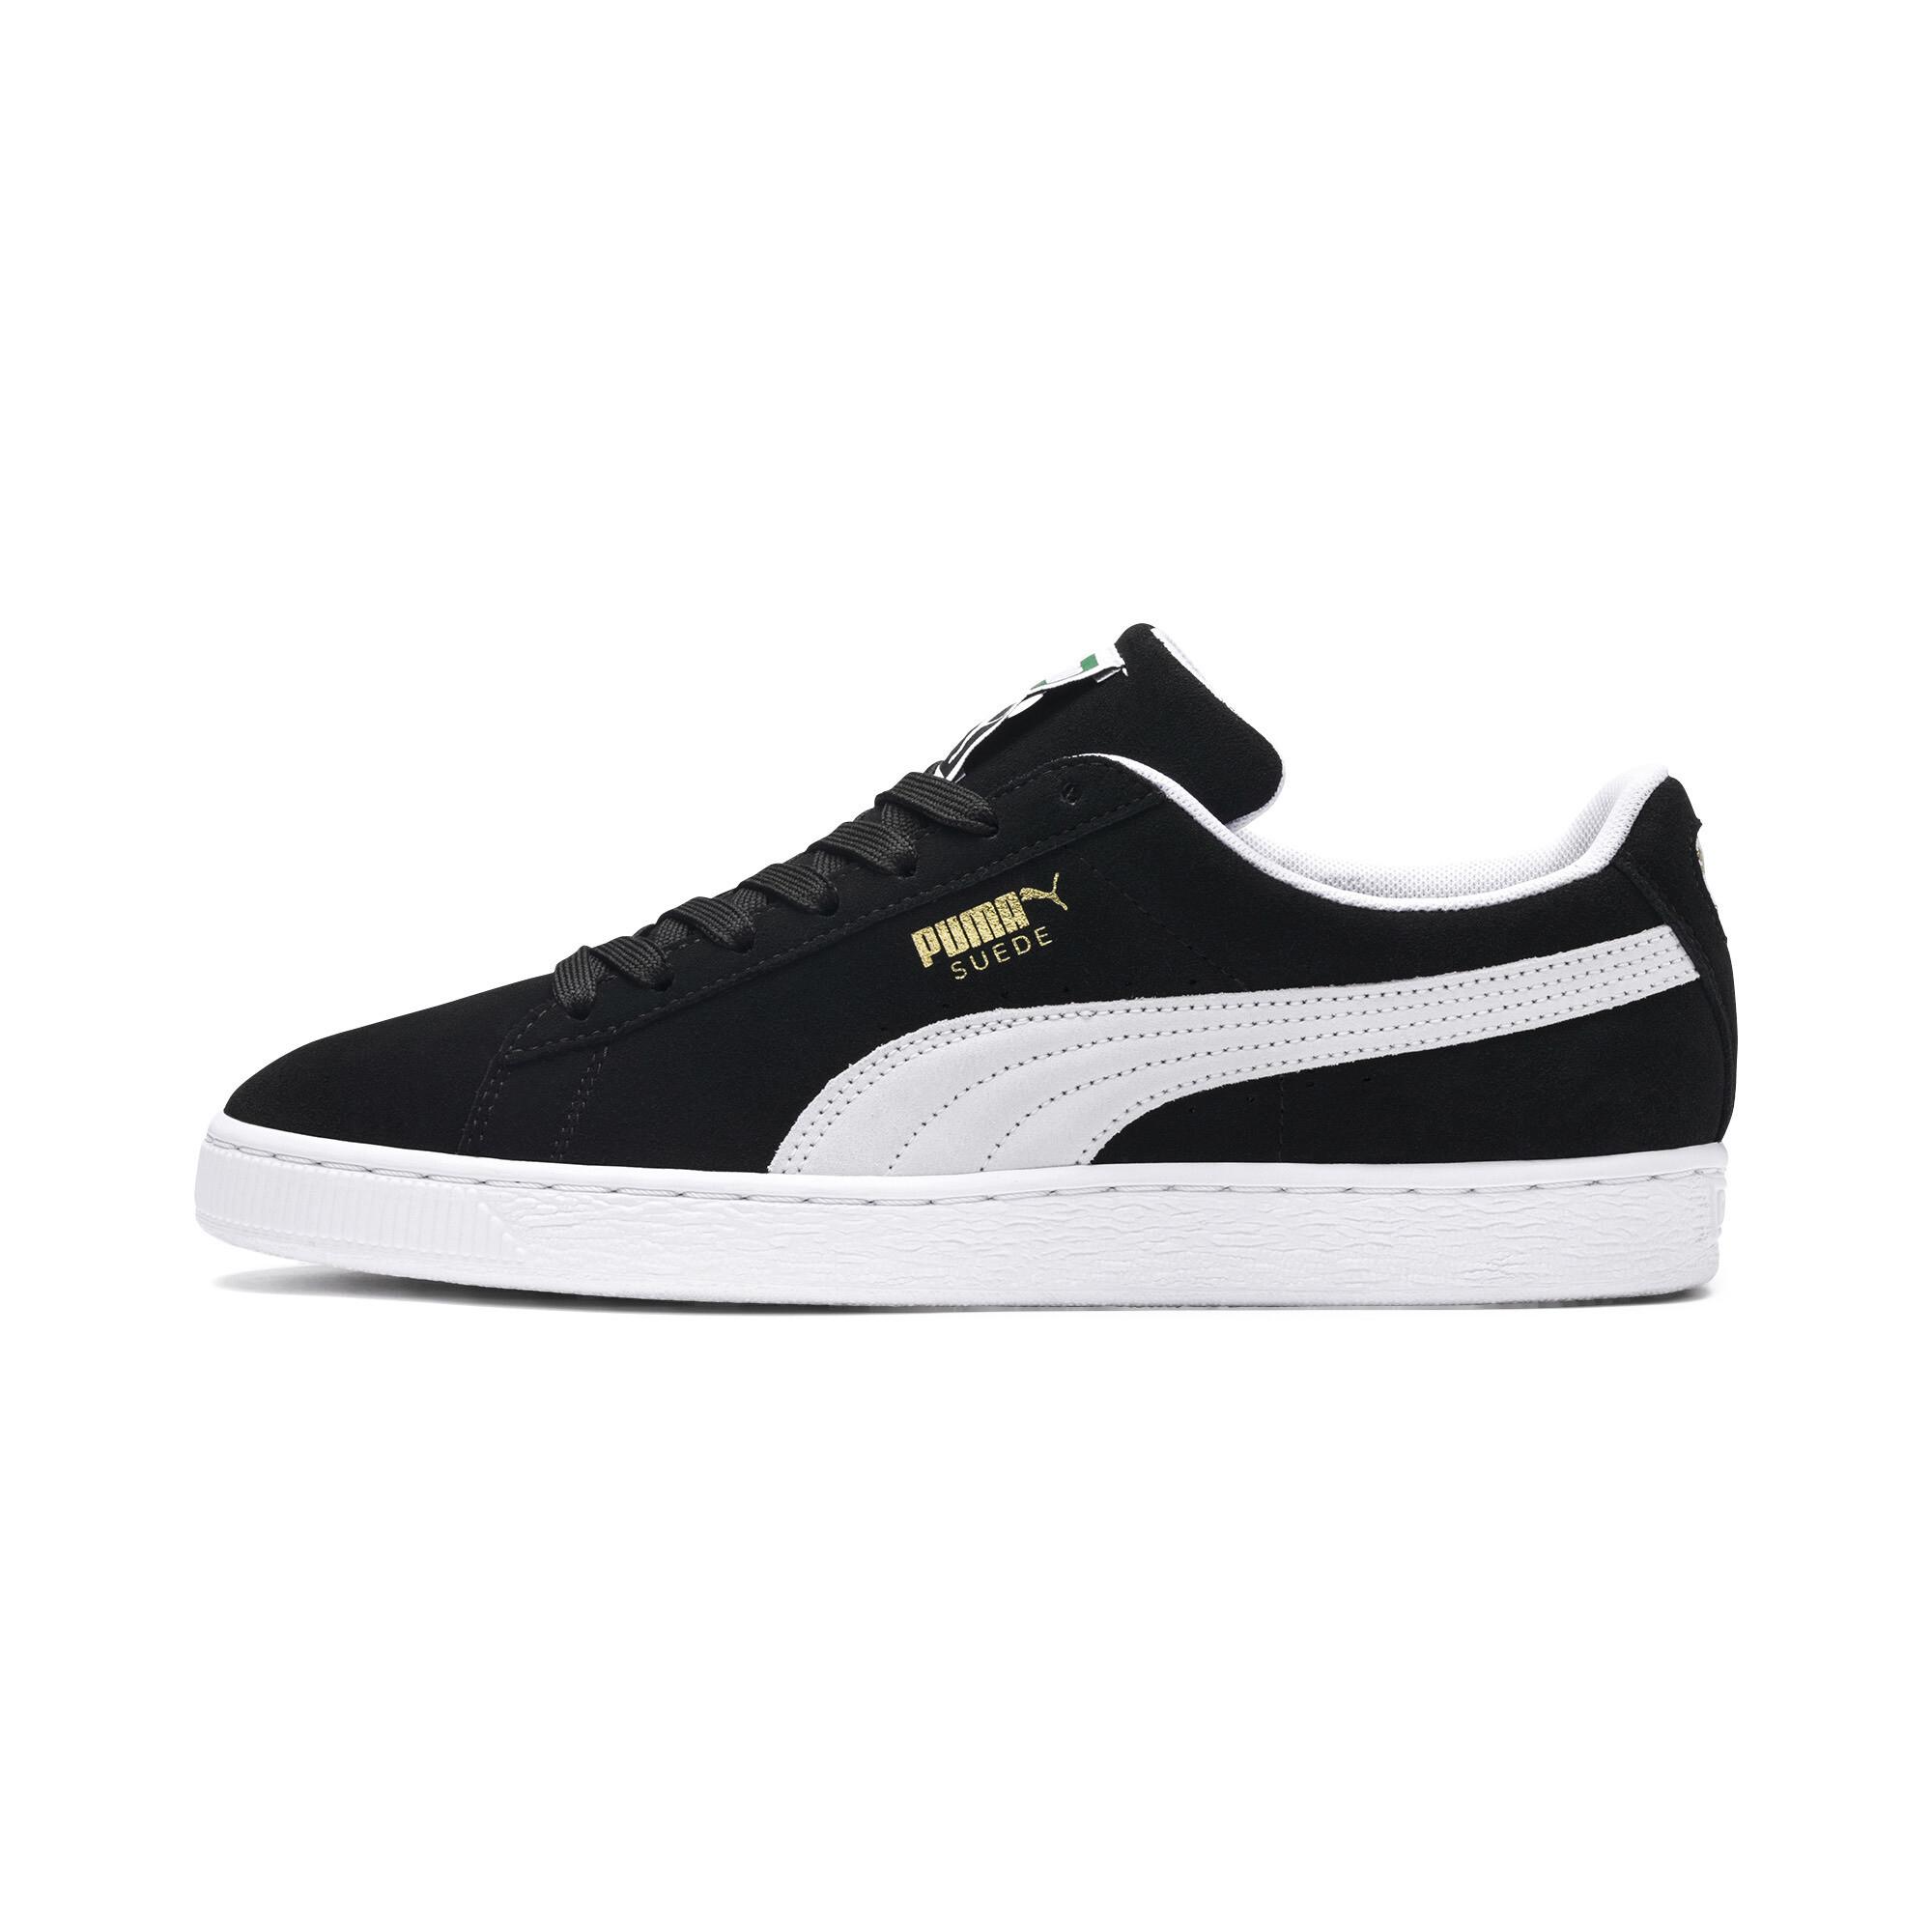 91357bd8a2a Shoes - Mens